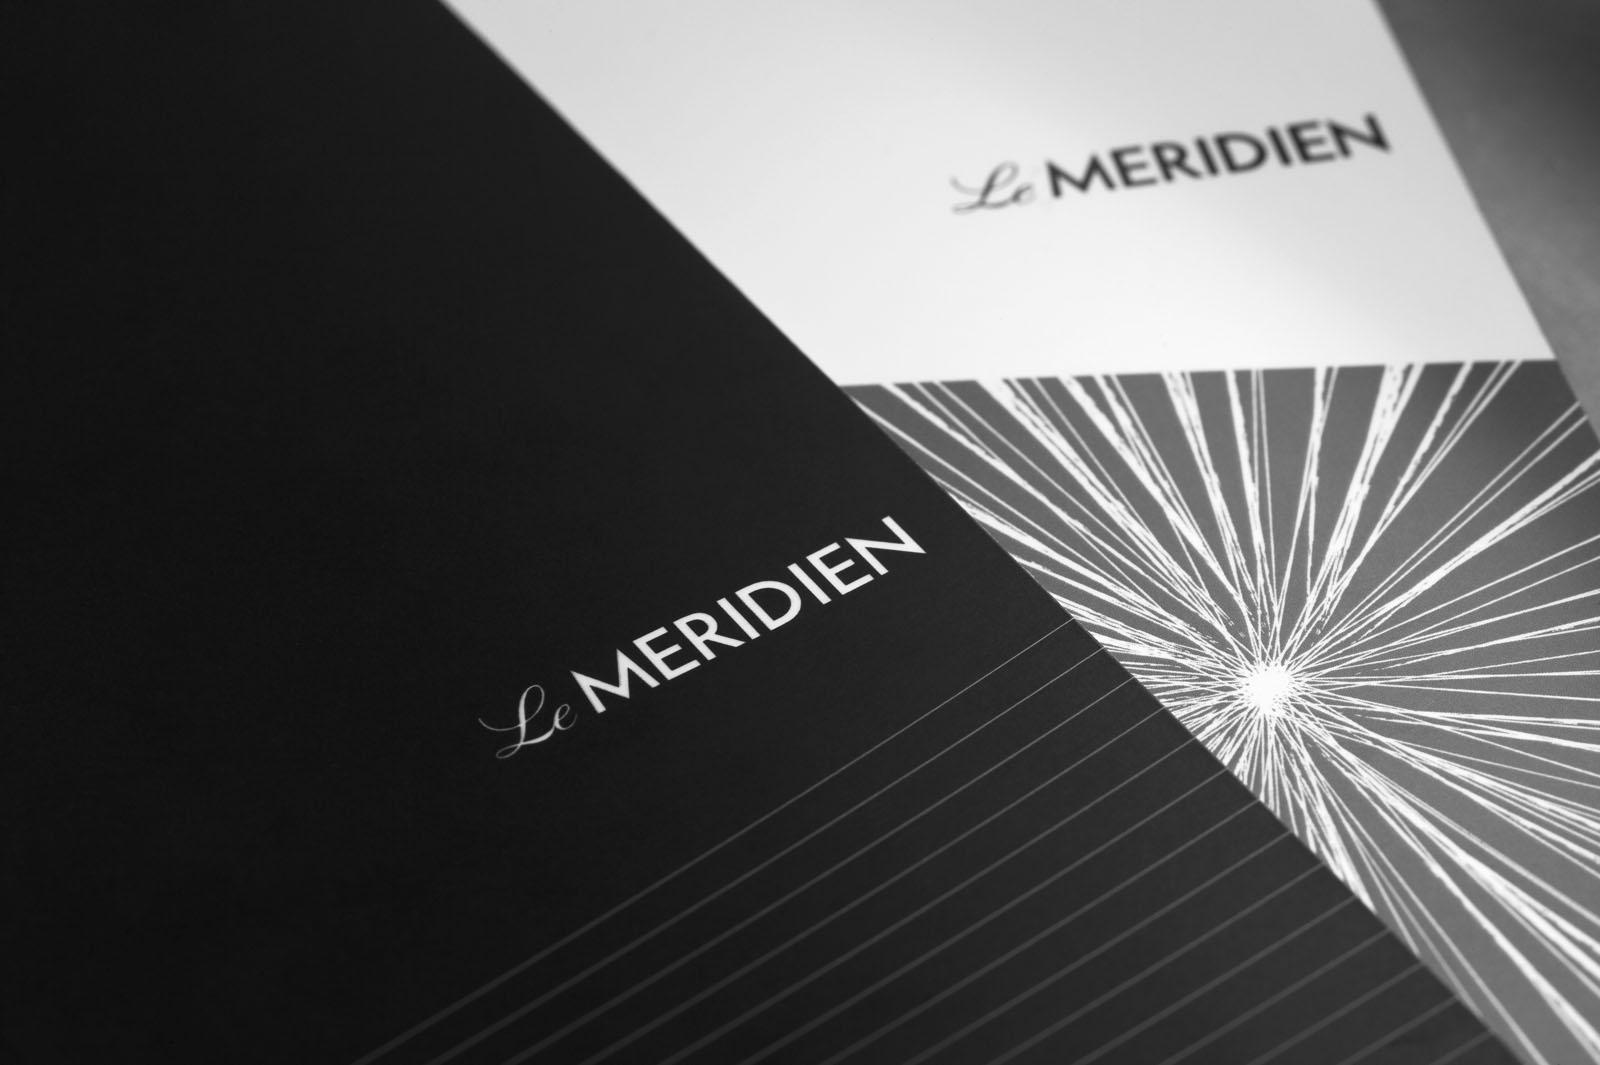 lm-menus_02_4web.jpg